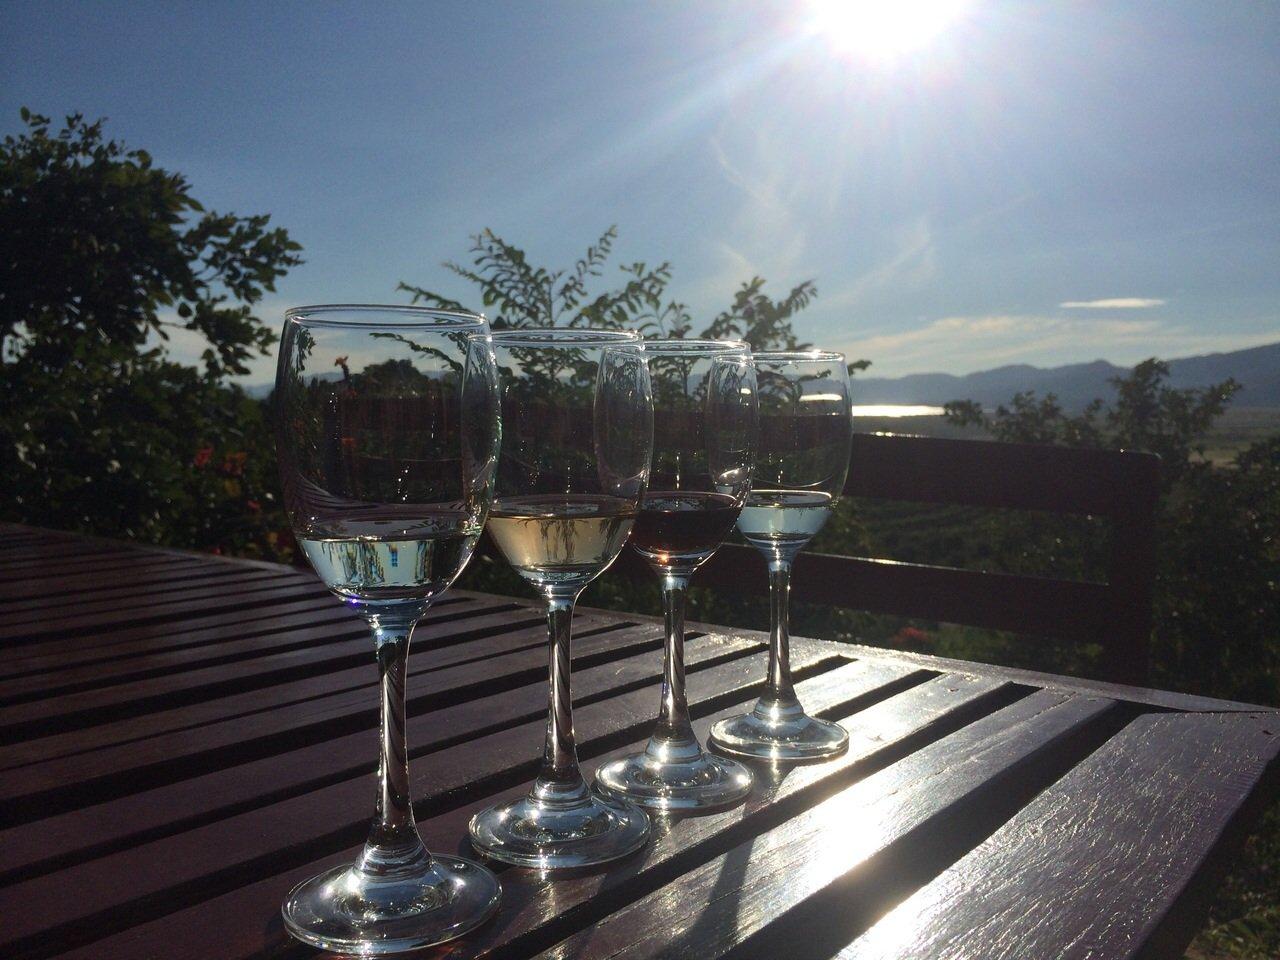 Eten en drinken in Inle Lake Myanmar Wijnproeverij Inle Lake Myanmar